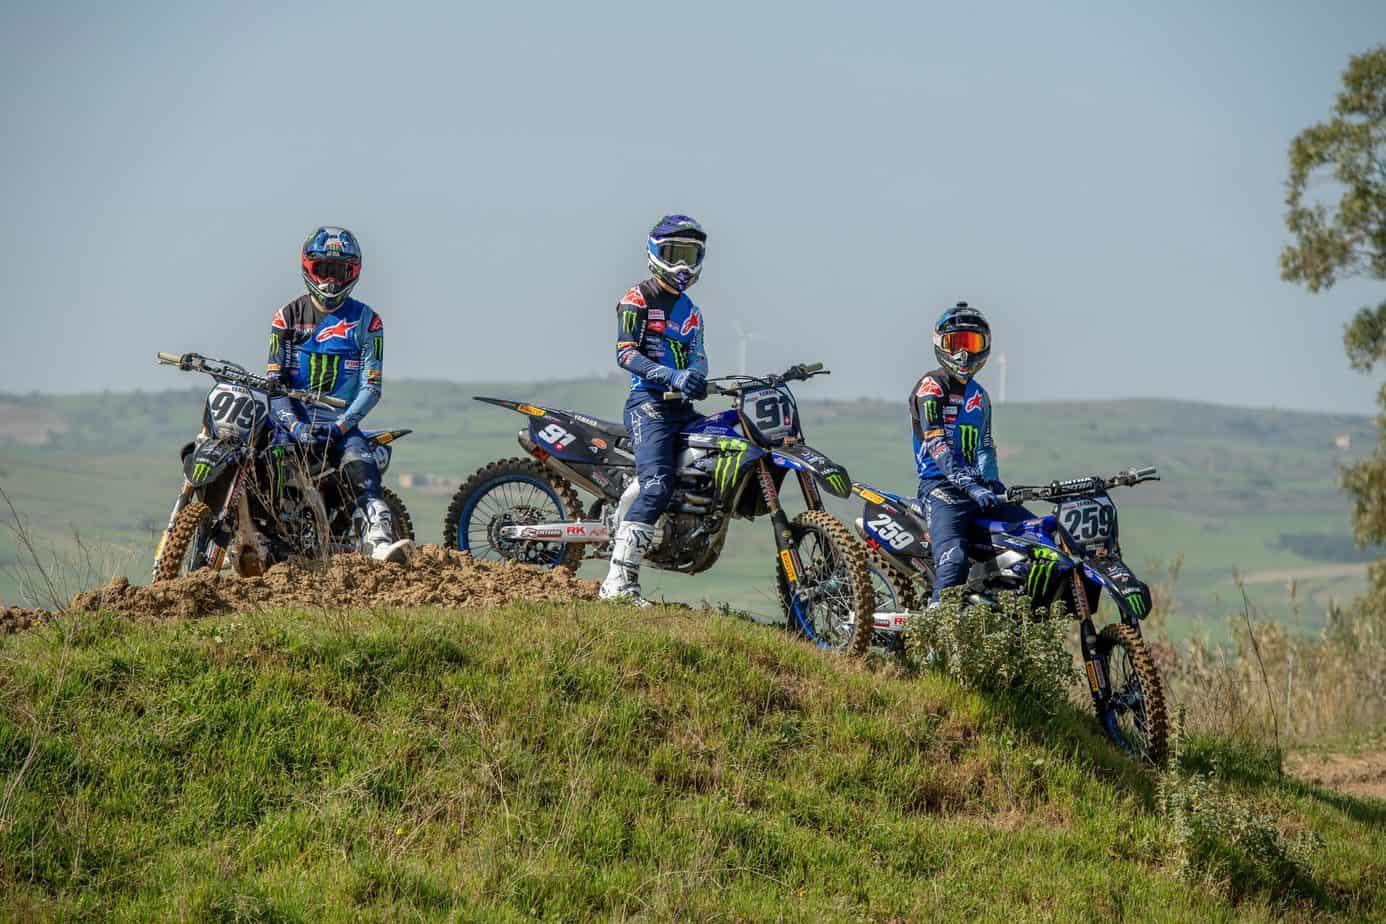 Zespoły Monster Energy Yamaha Factory trenowały we Włoszech